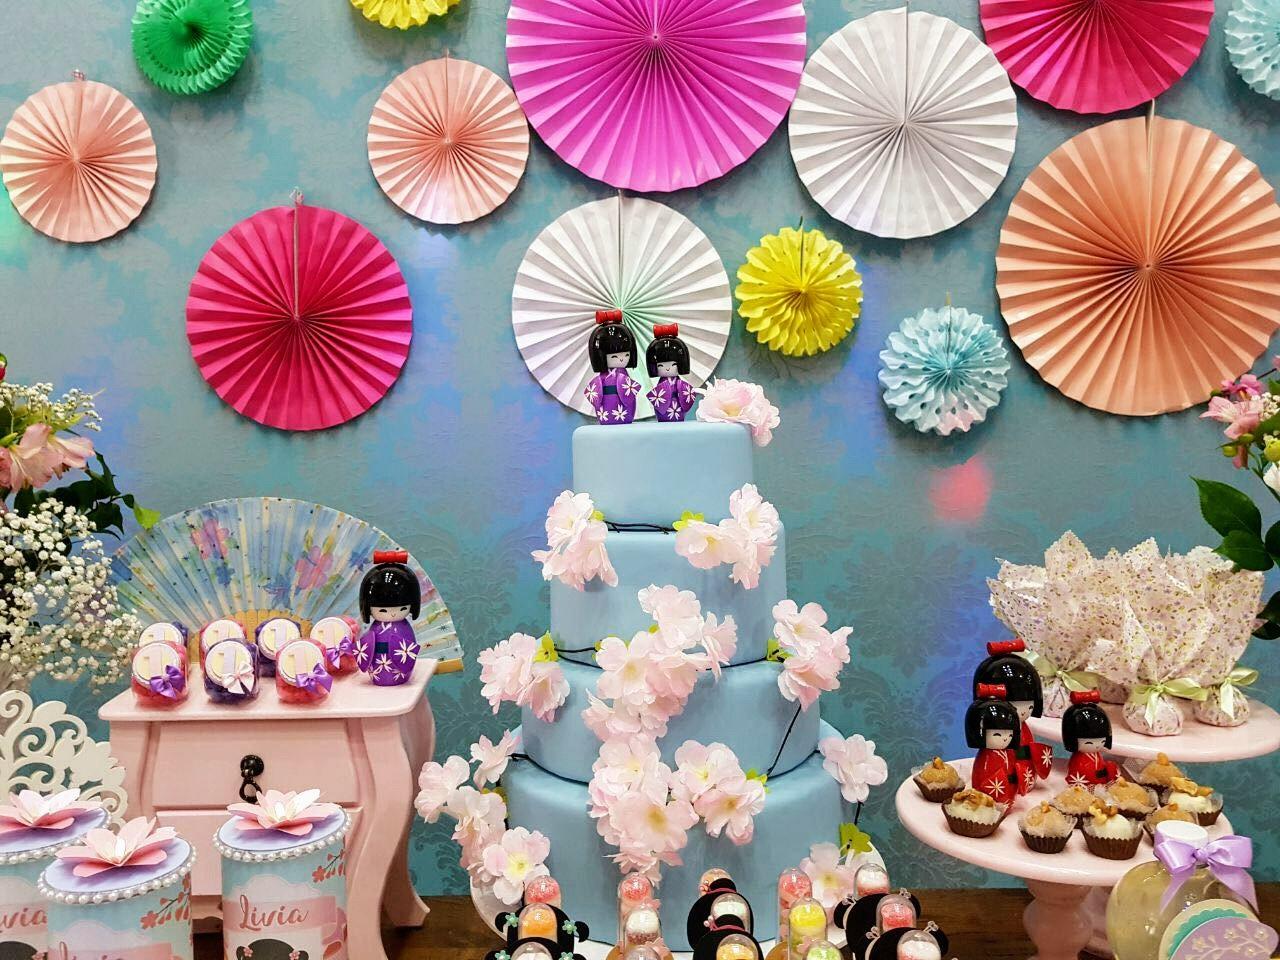 Decoração festa kokeshi japonesa (1).jpg